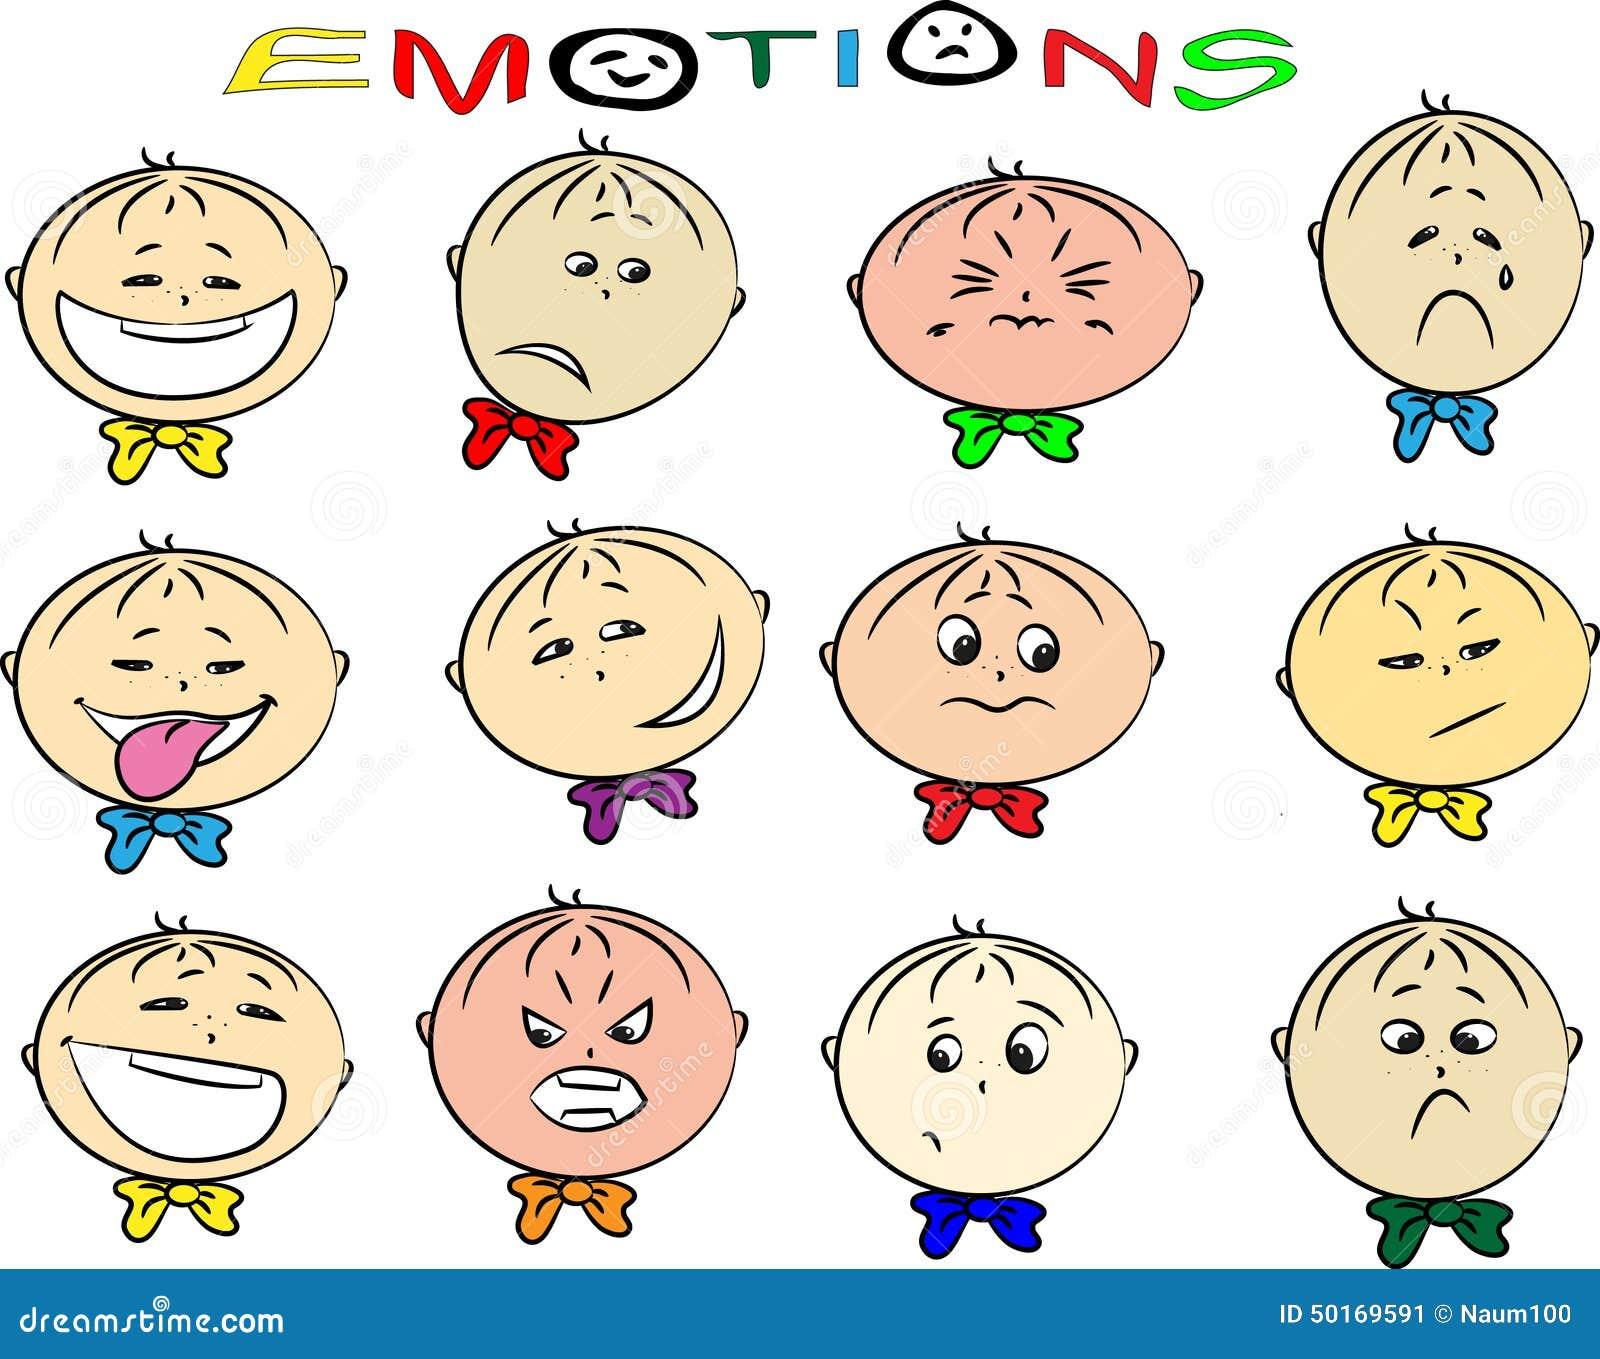 Картинки маски эмоций